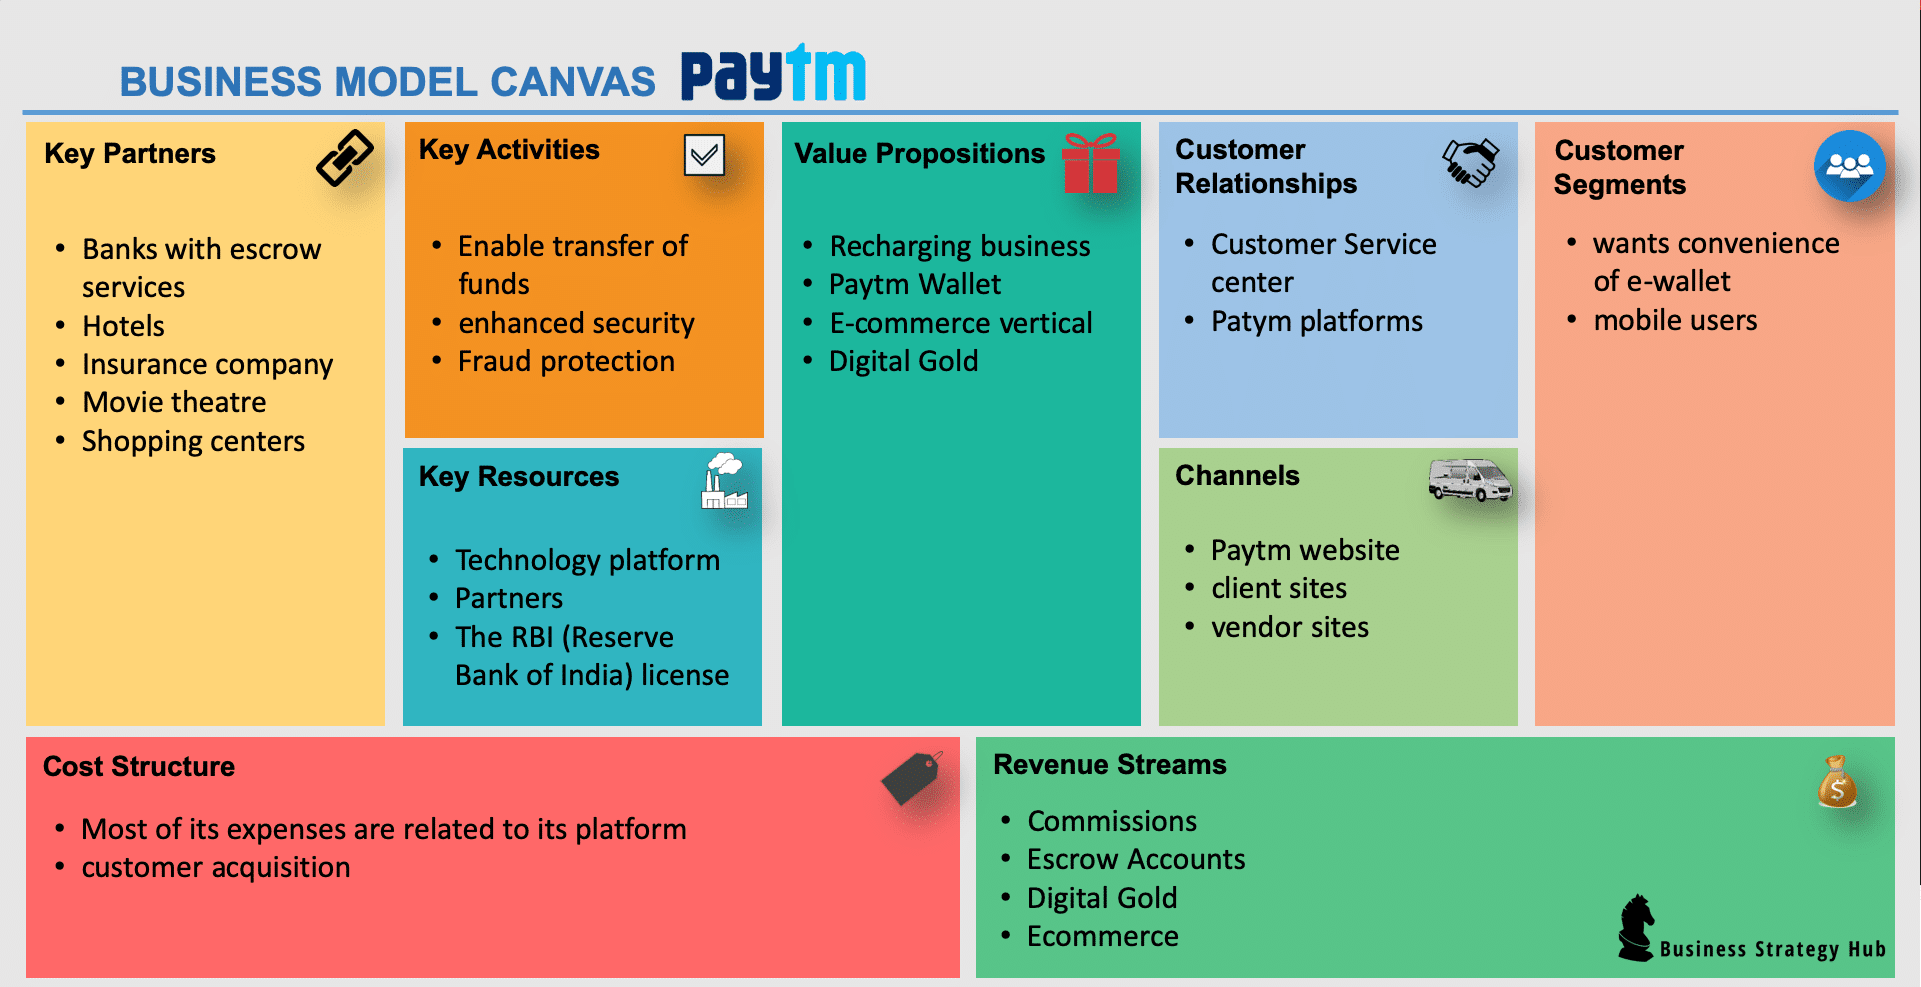 Paytm Business Model | How does Paytm make money | Business